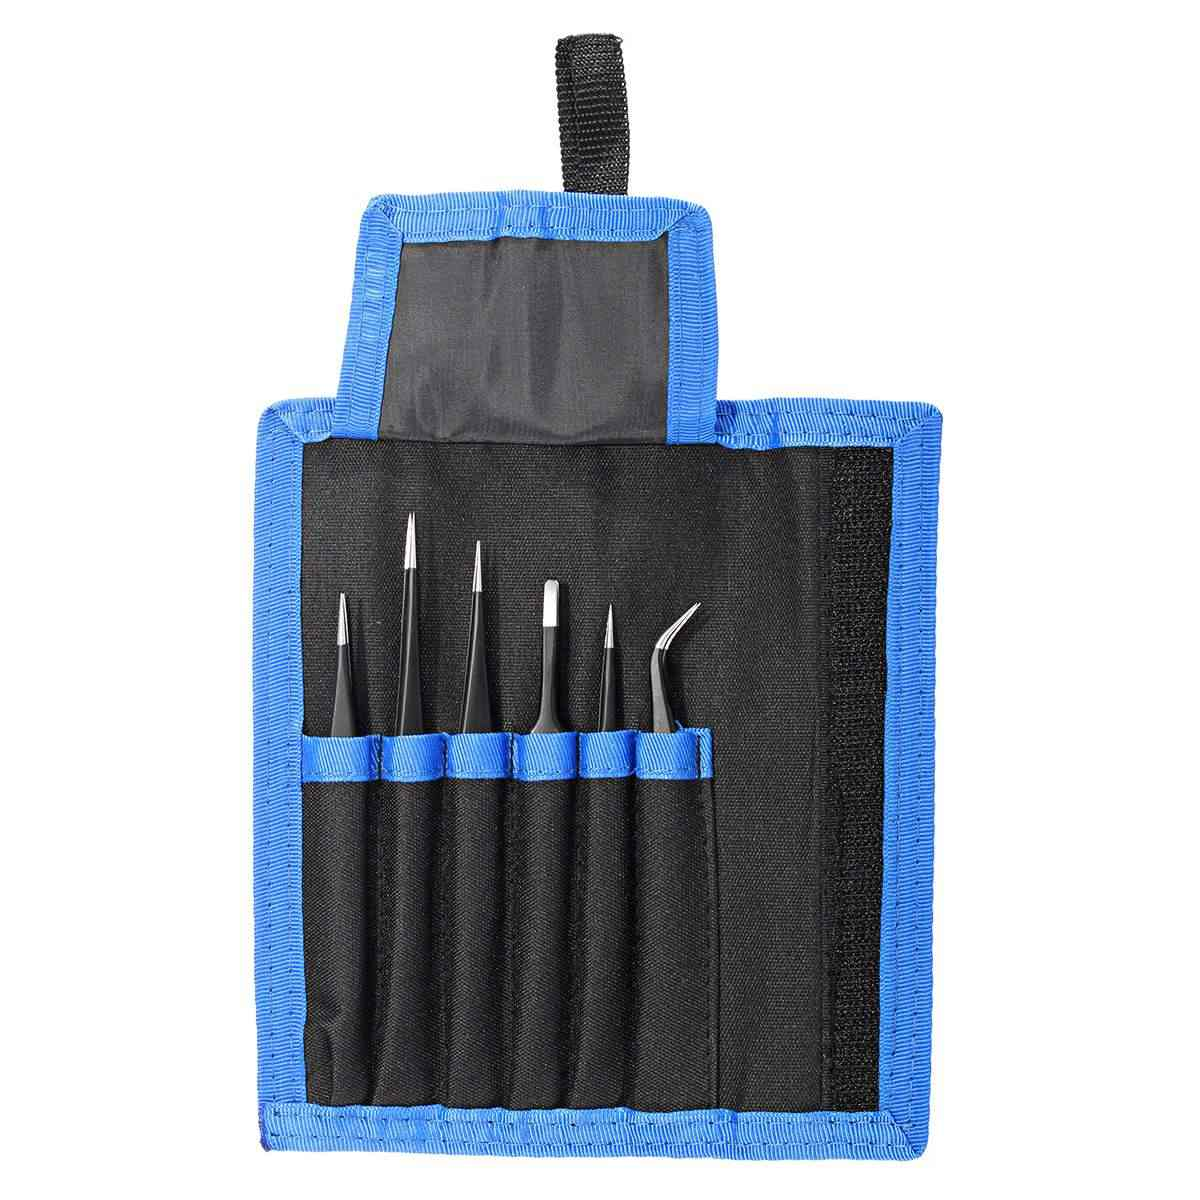 6Pcs Safe Anti-static Tweezers Maintenance Repair Nippers Forceps Tools Kit ESD10-15